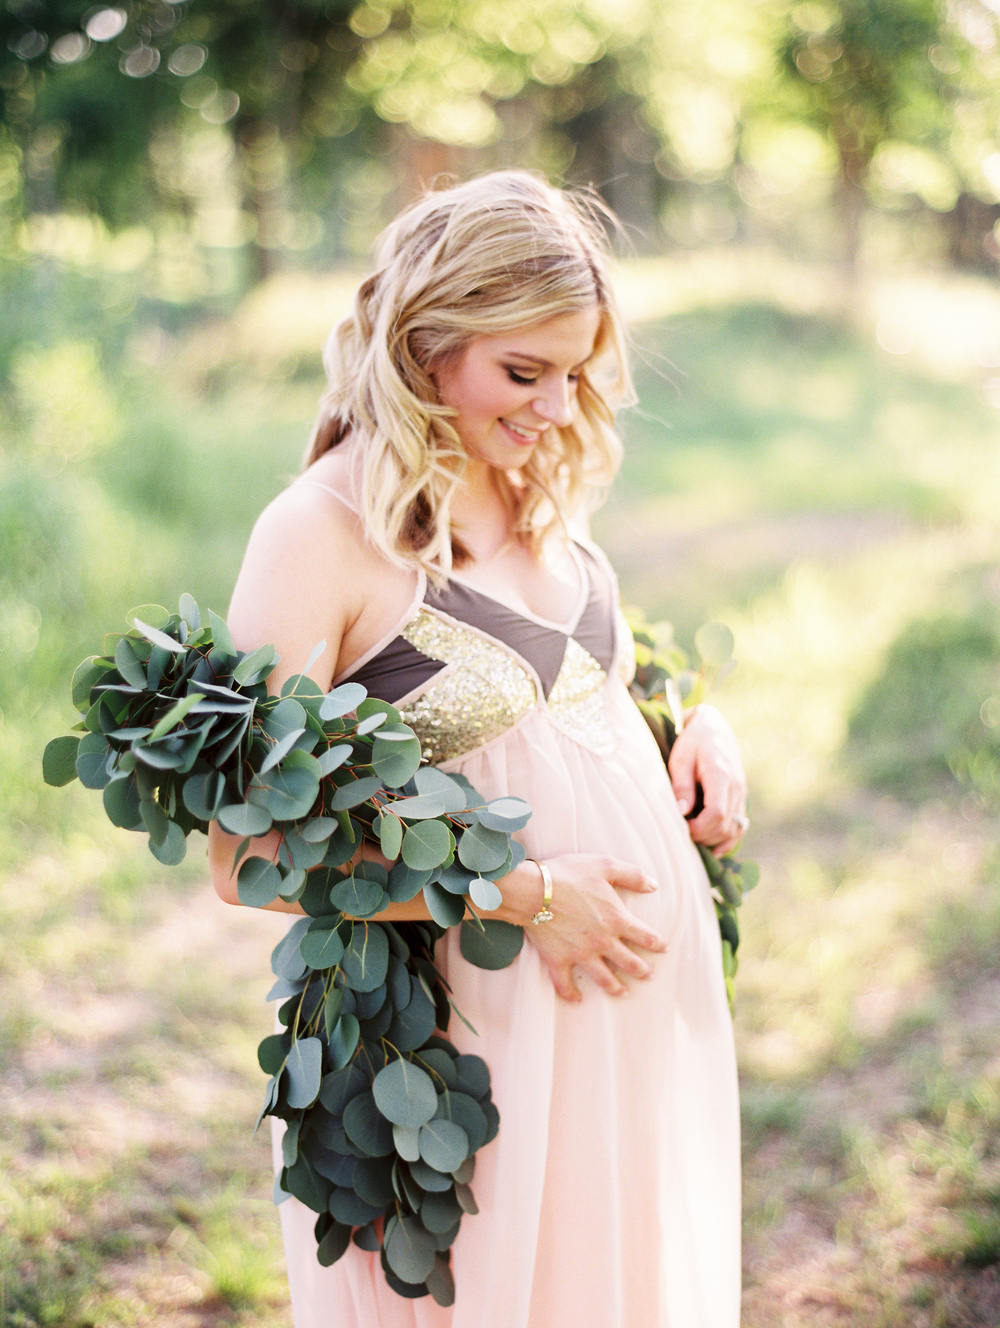 Dana Fernandez Photography Inspired by This Maternity Houston Photographer Wedding Destination Film Fine Art-6.jpg